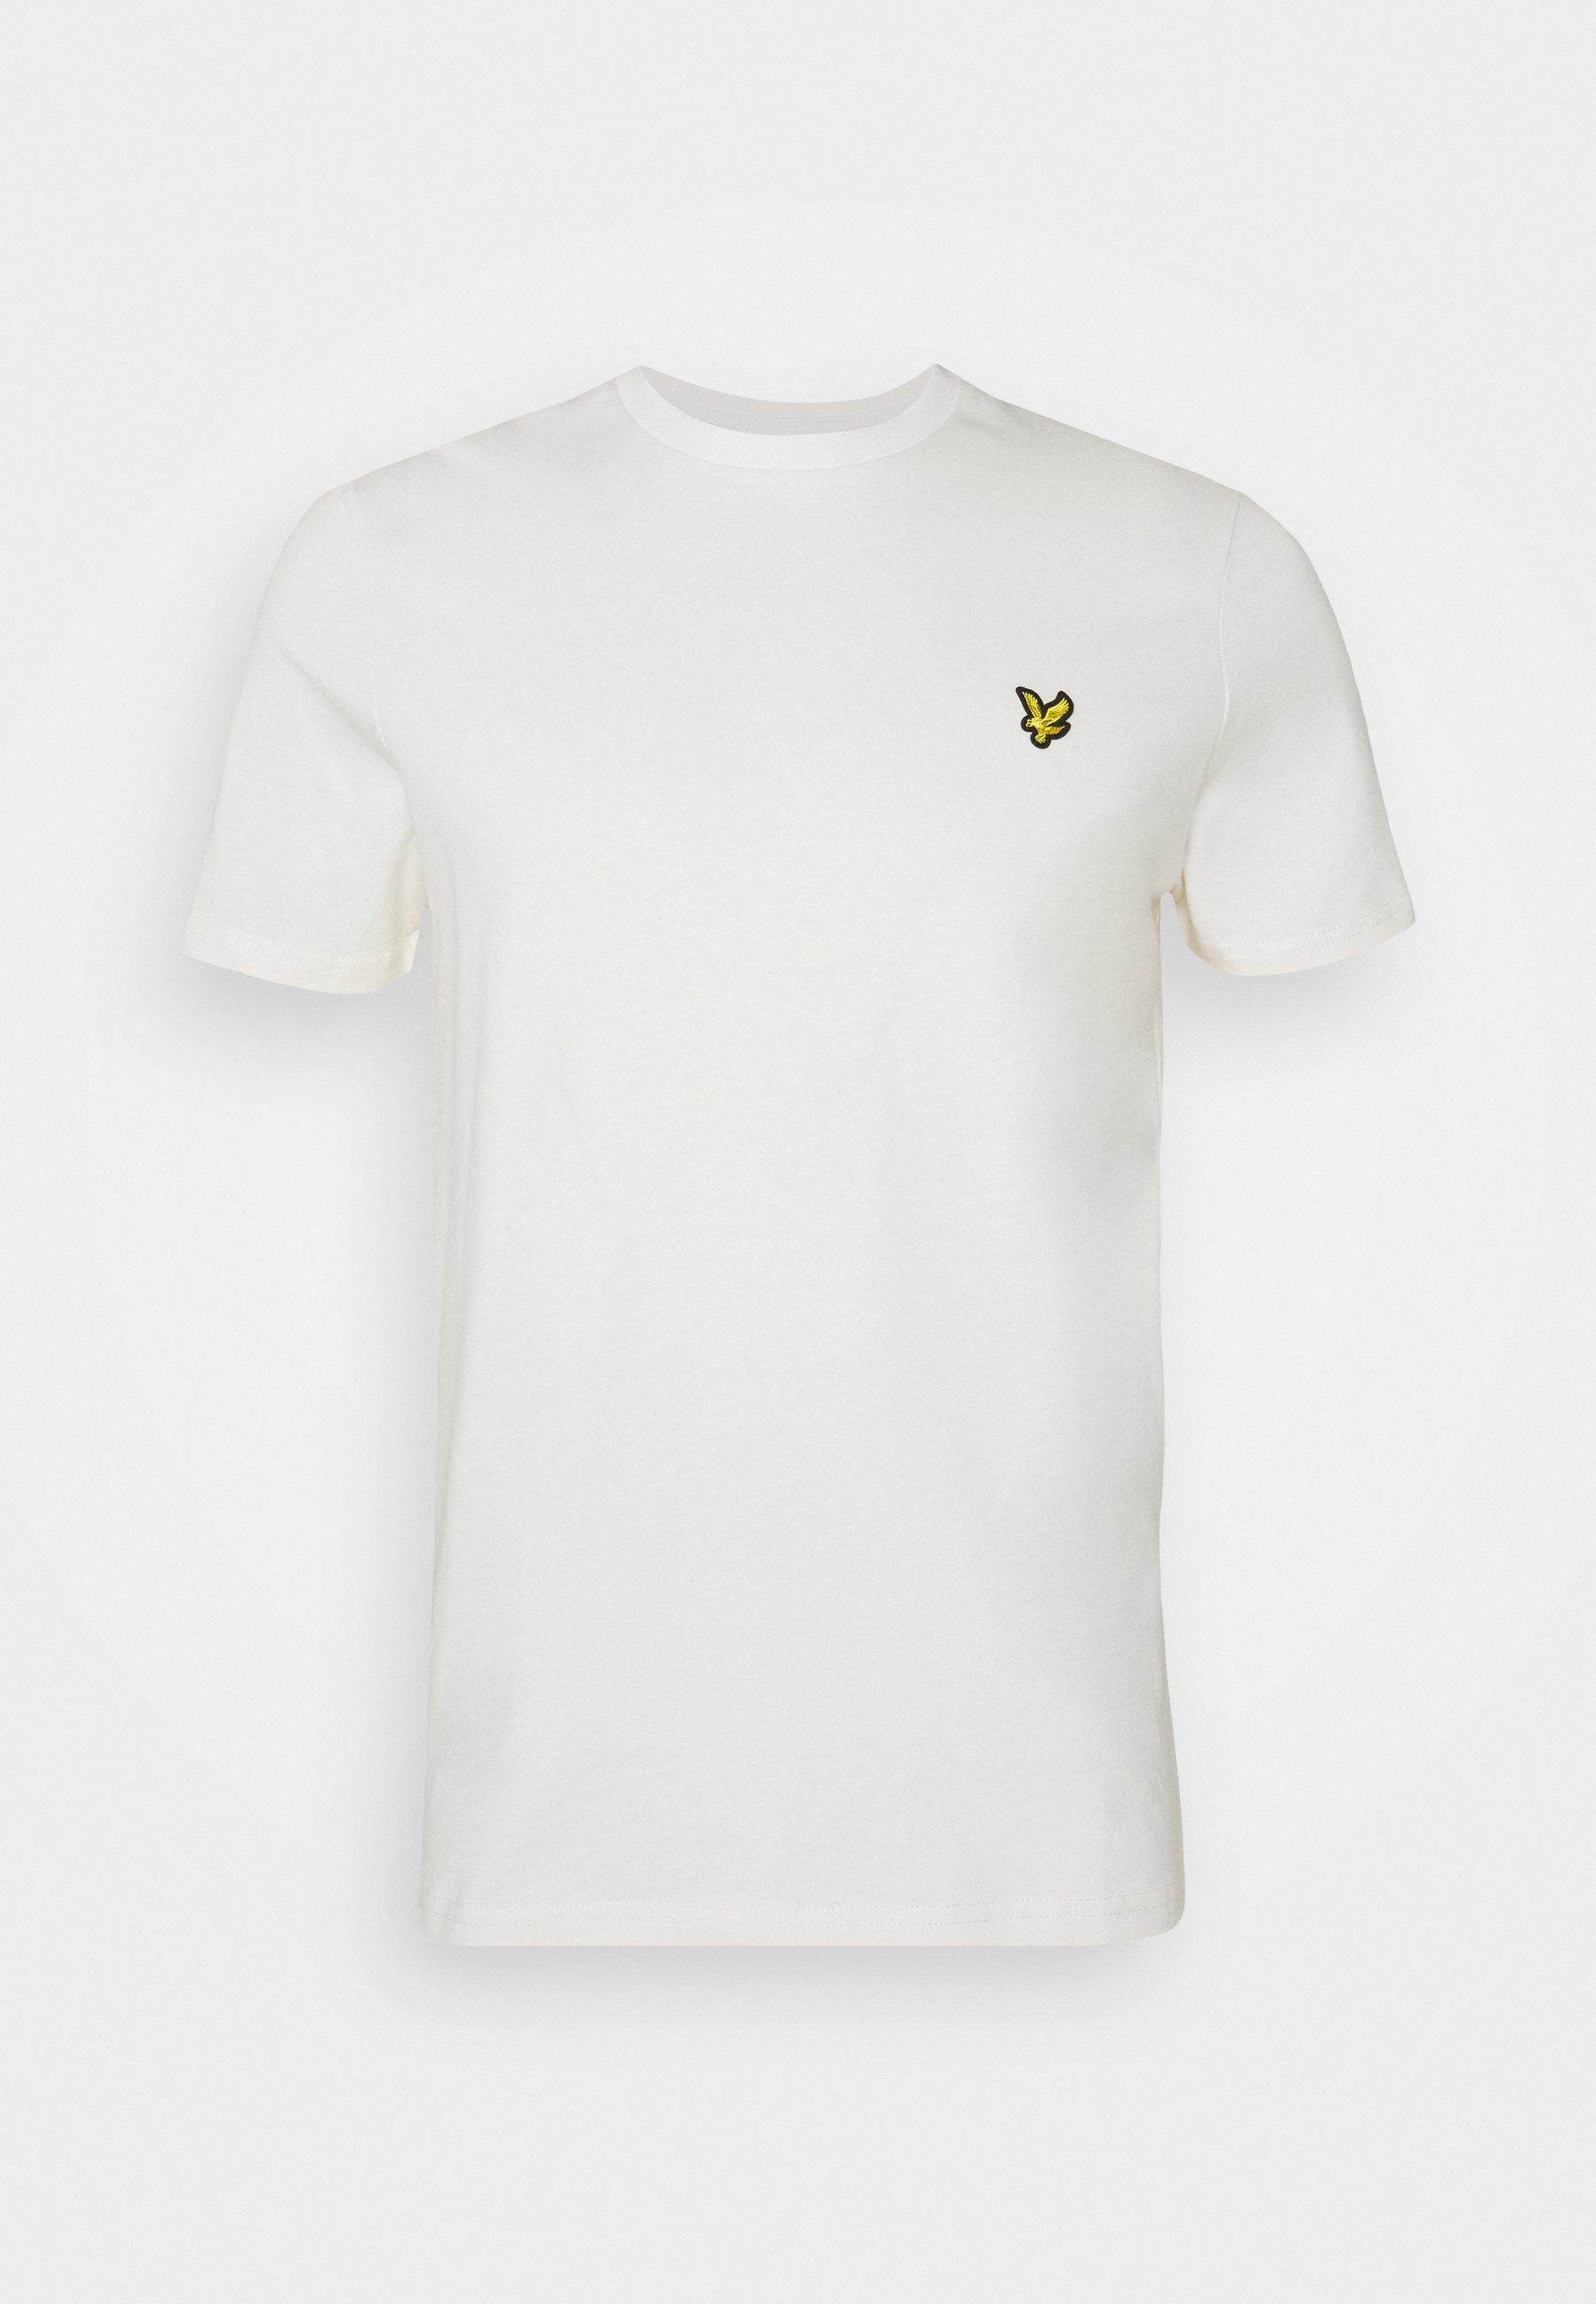 Lyle & Scott T-shirts - Vanilla Ice/offwhite